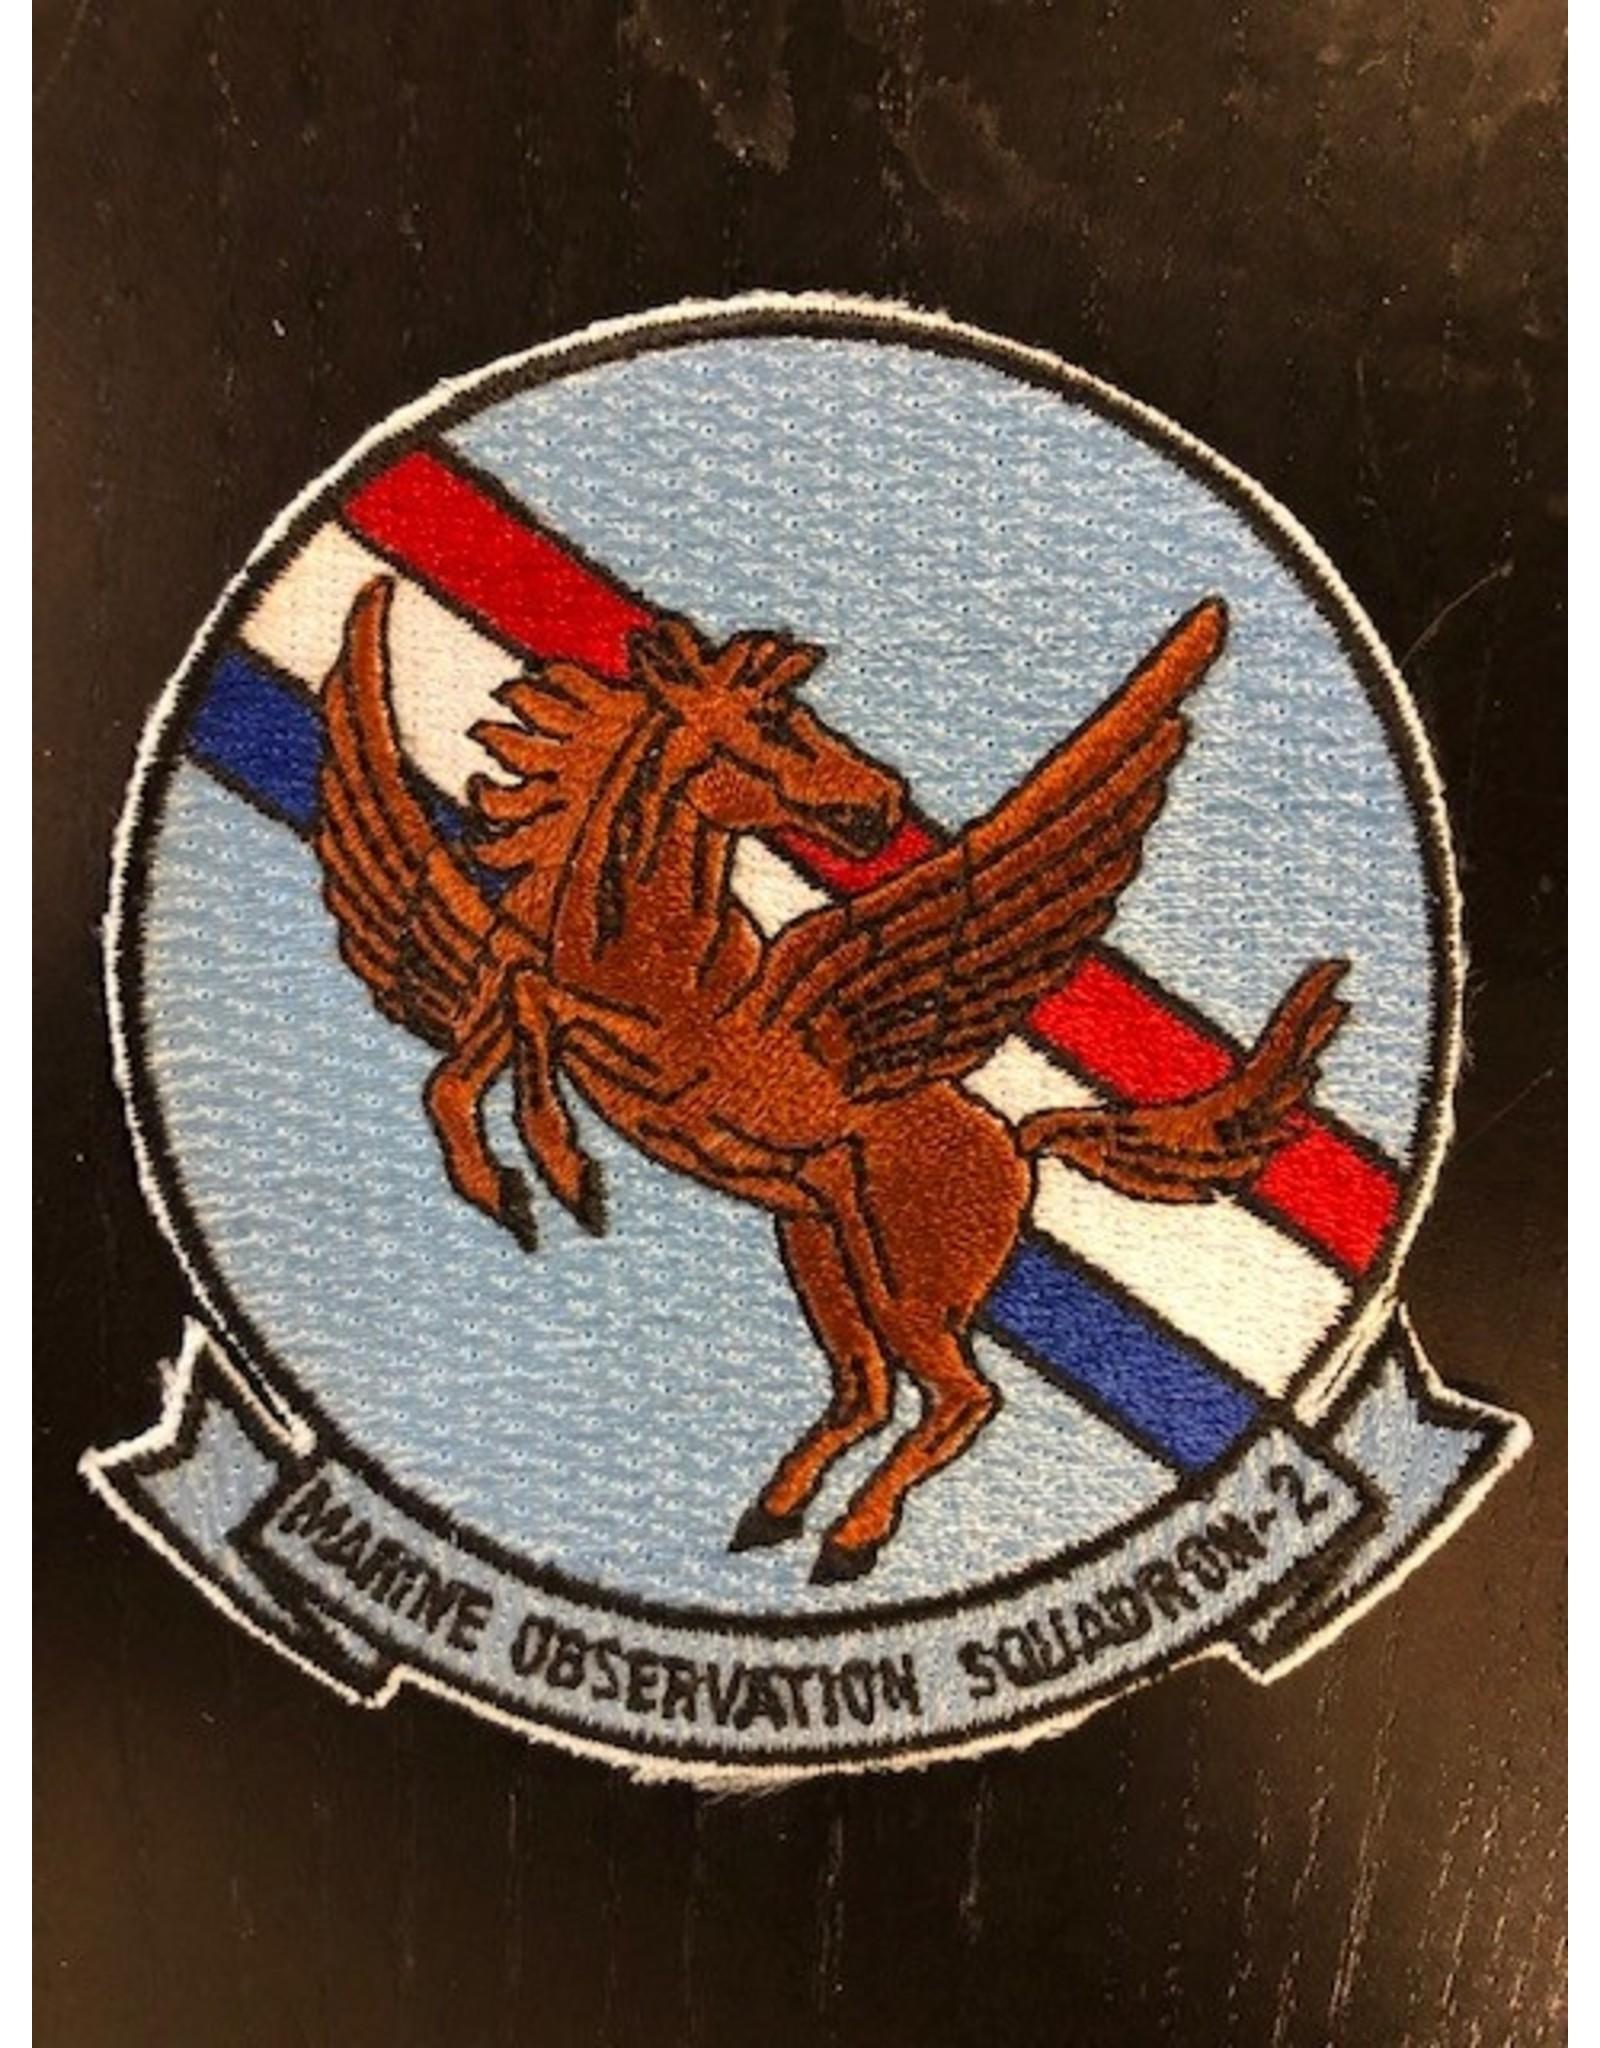 FWAM Marine Observation Squadron-2 Pegasus (15), patch